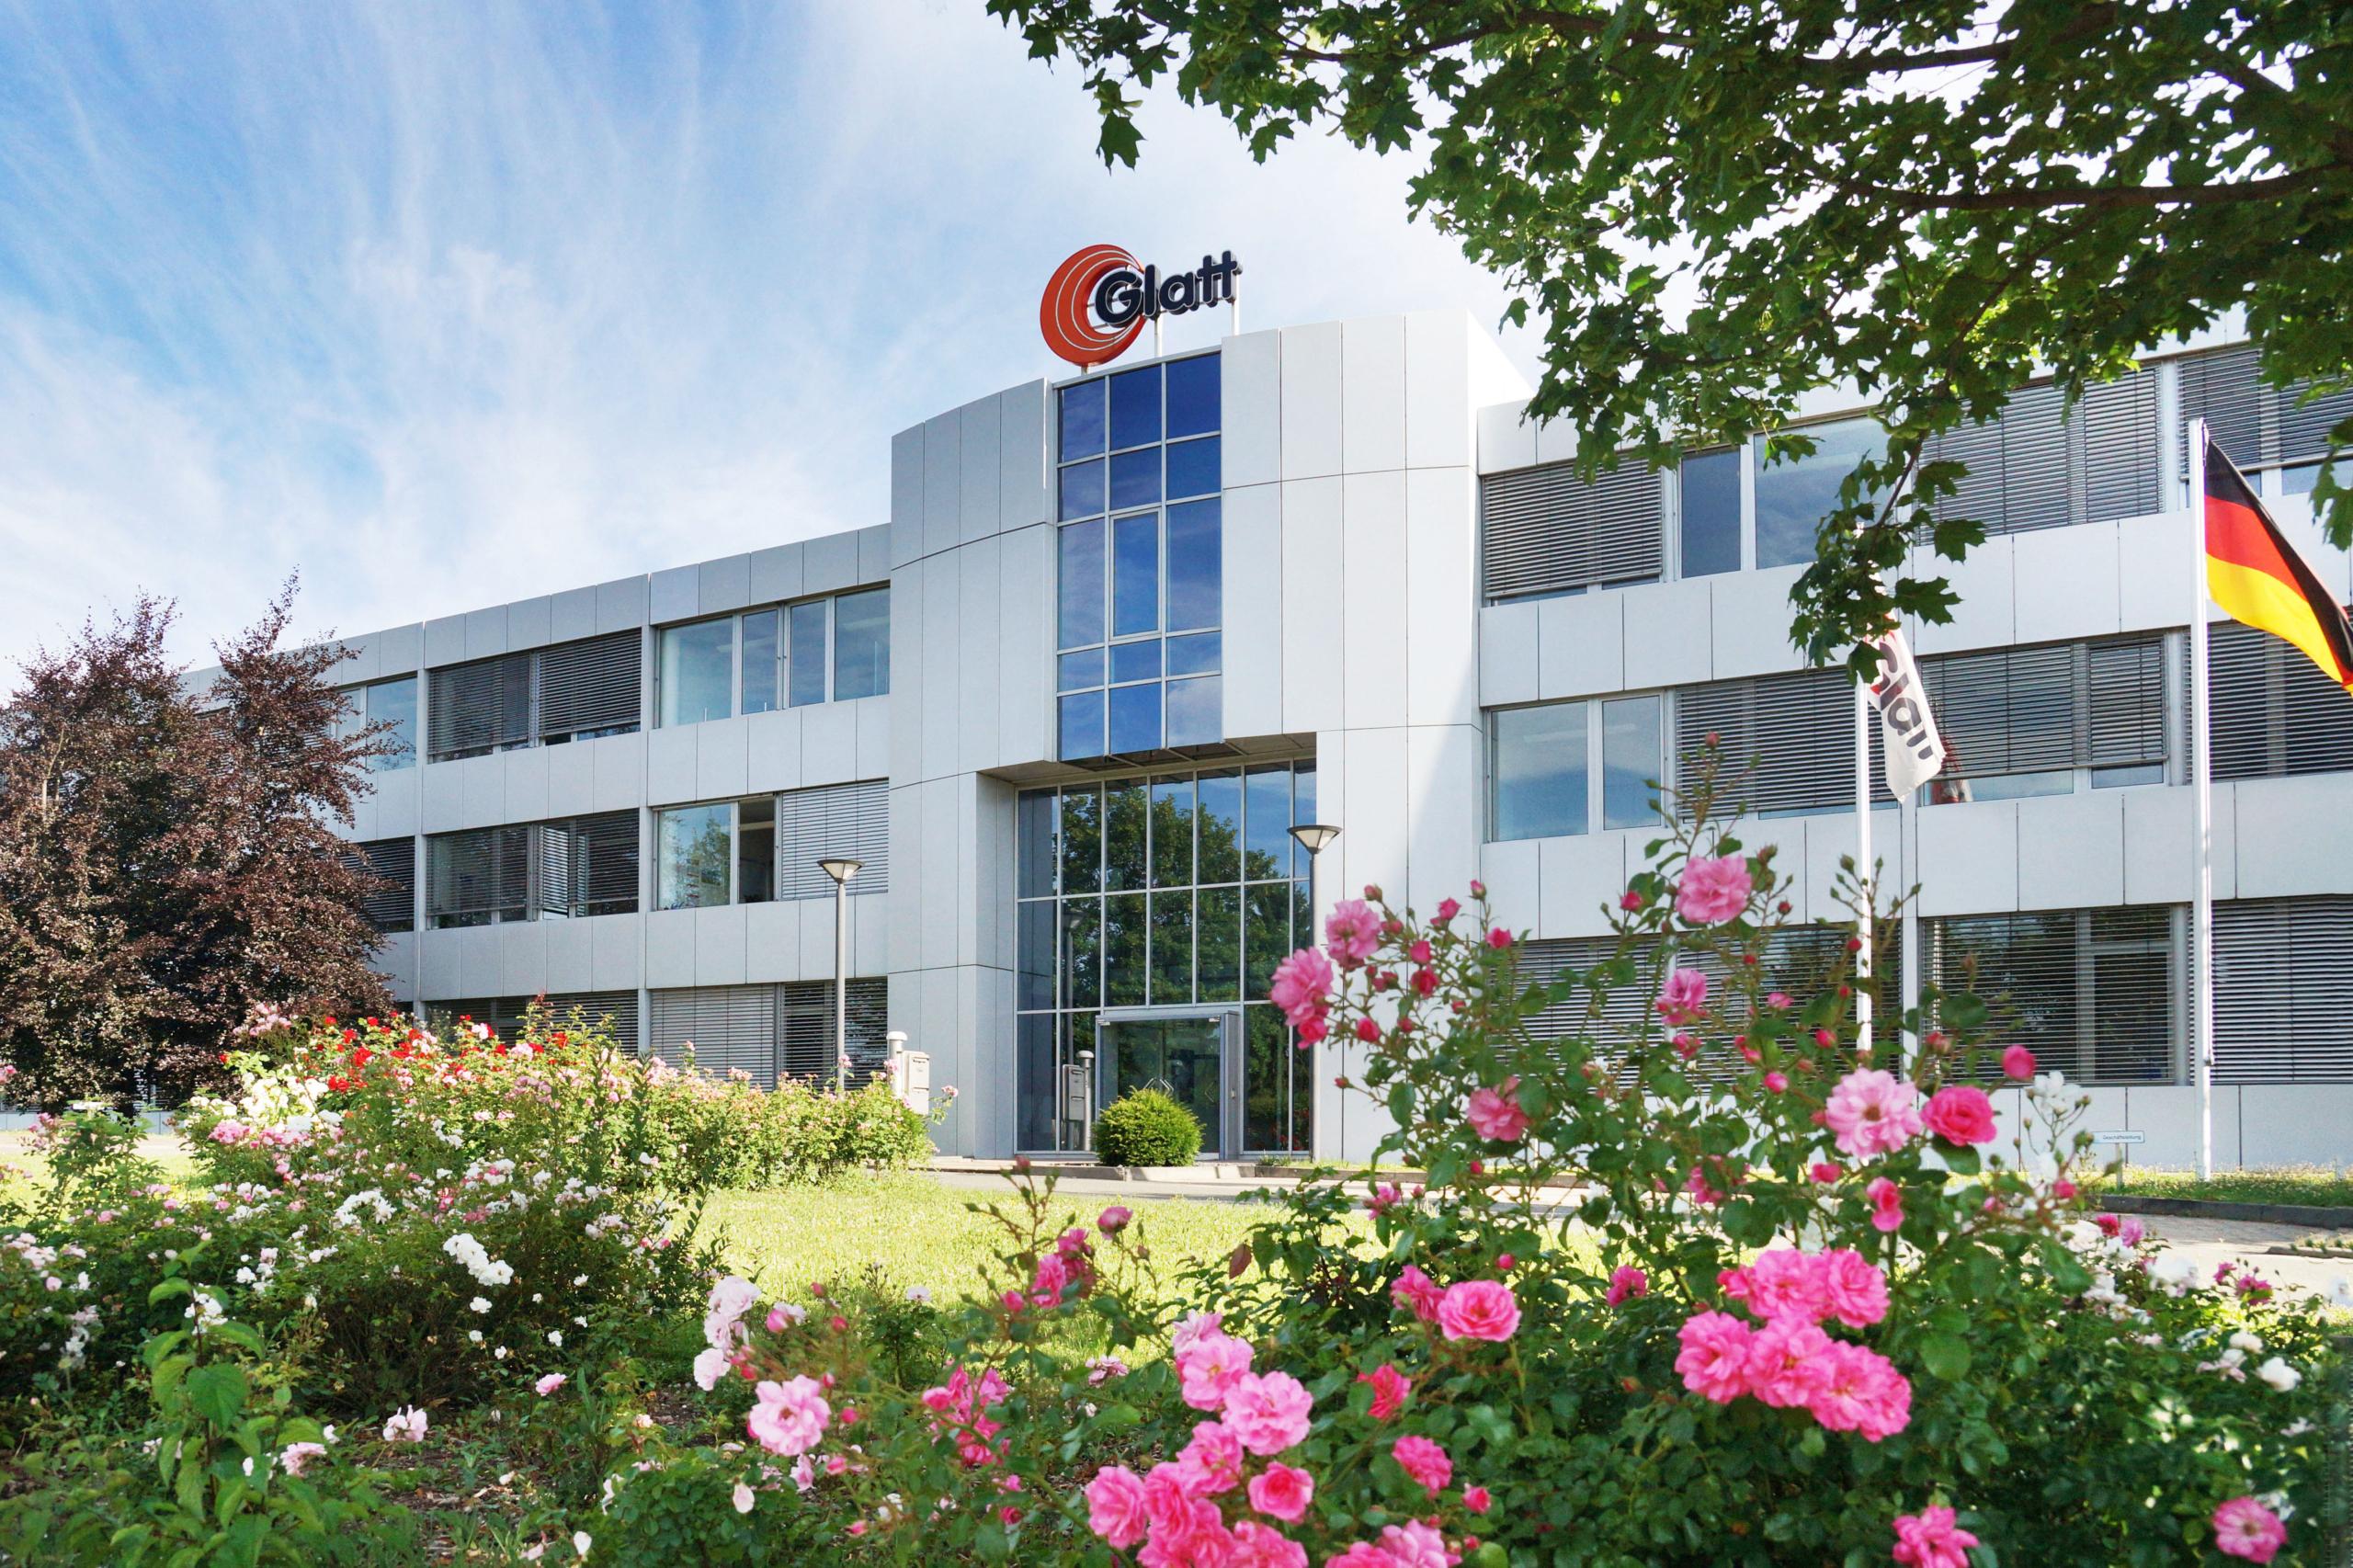 Glatt Ingenieurtechnik, company building at the company's headquarters in Weimar, Germany